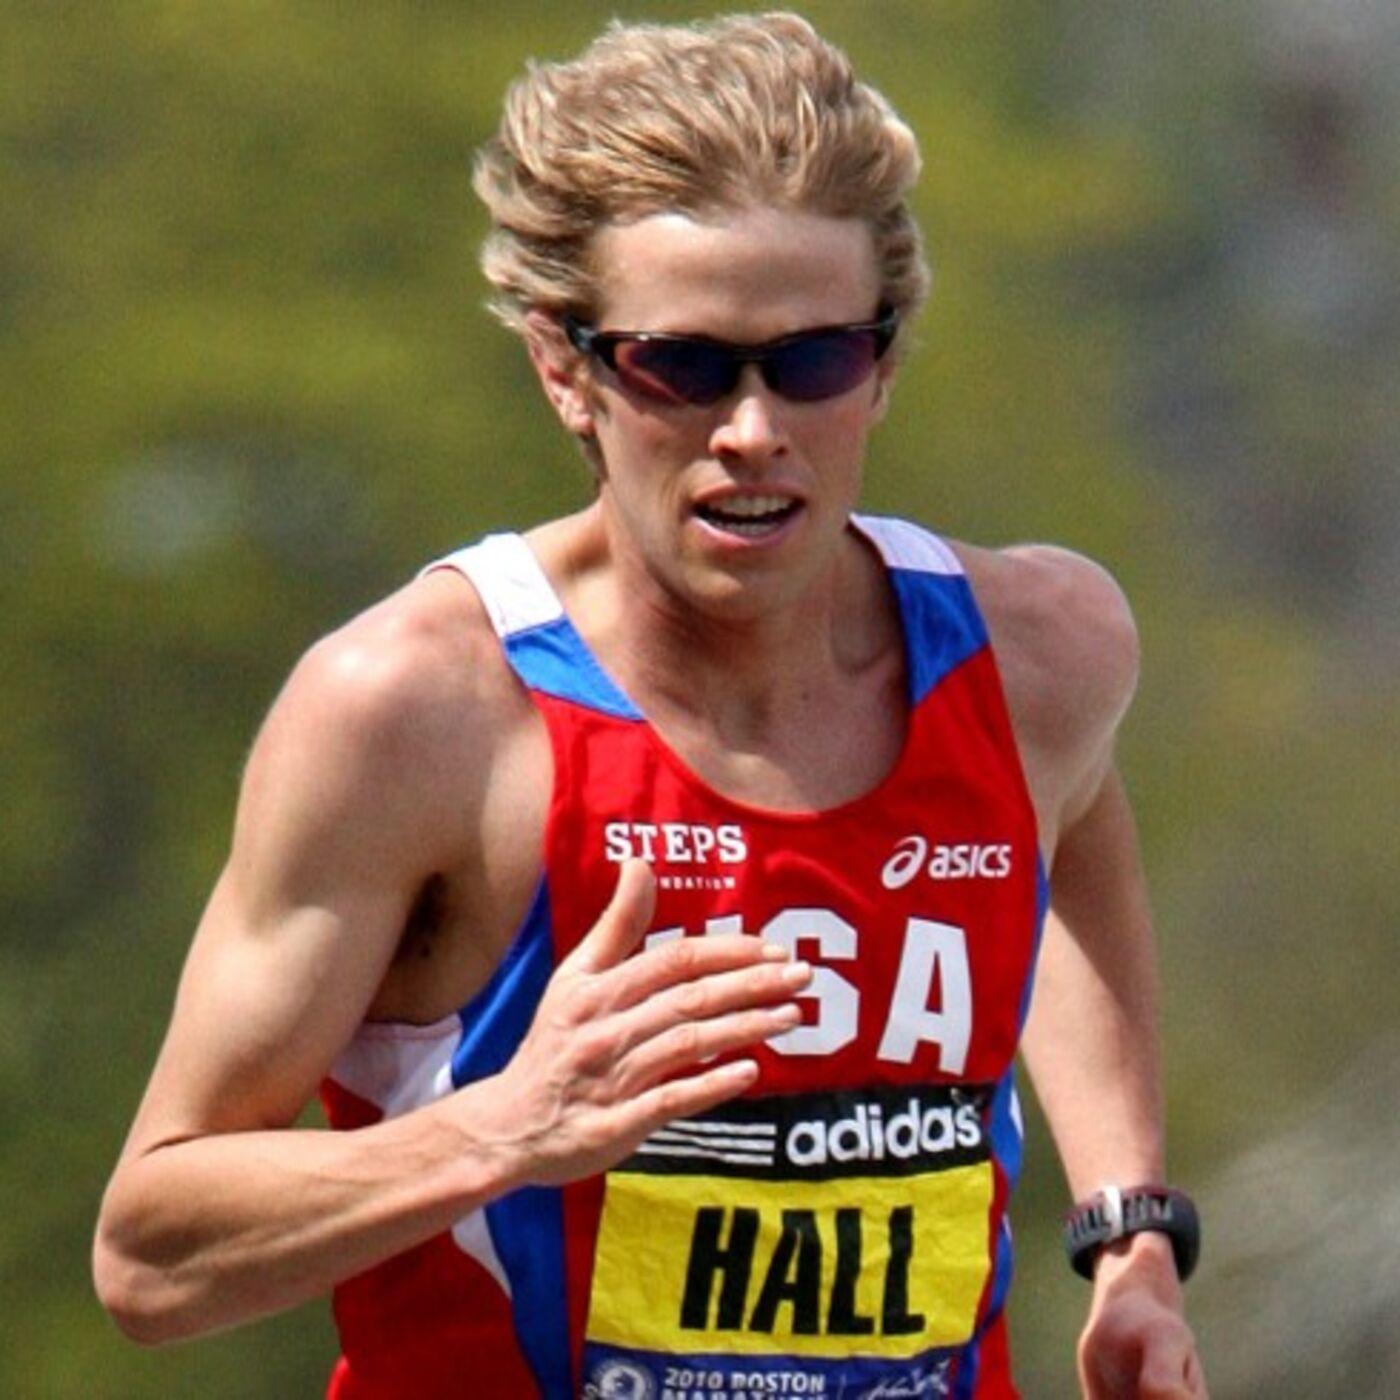 Ryan Hall: Olympian and American Marathon Record Holder - Episode #128